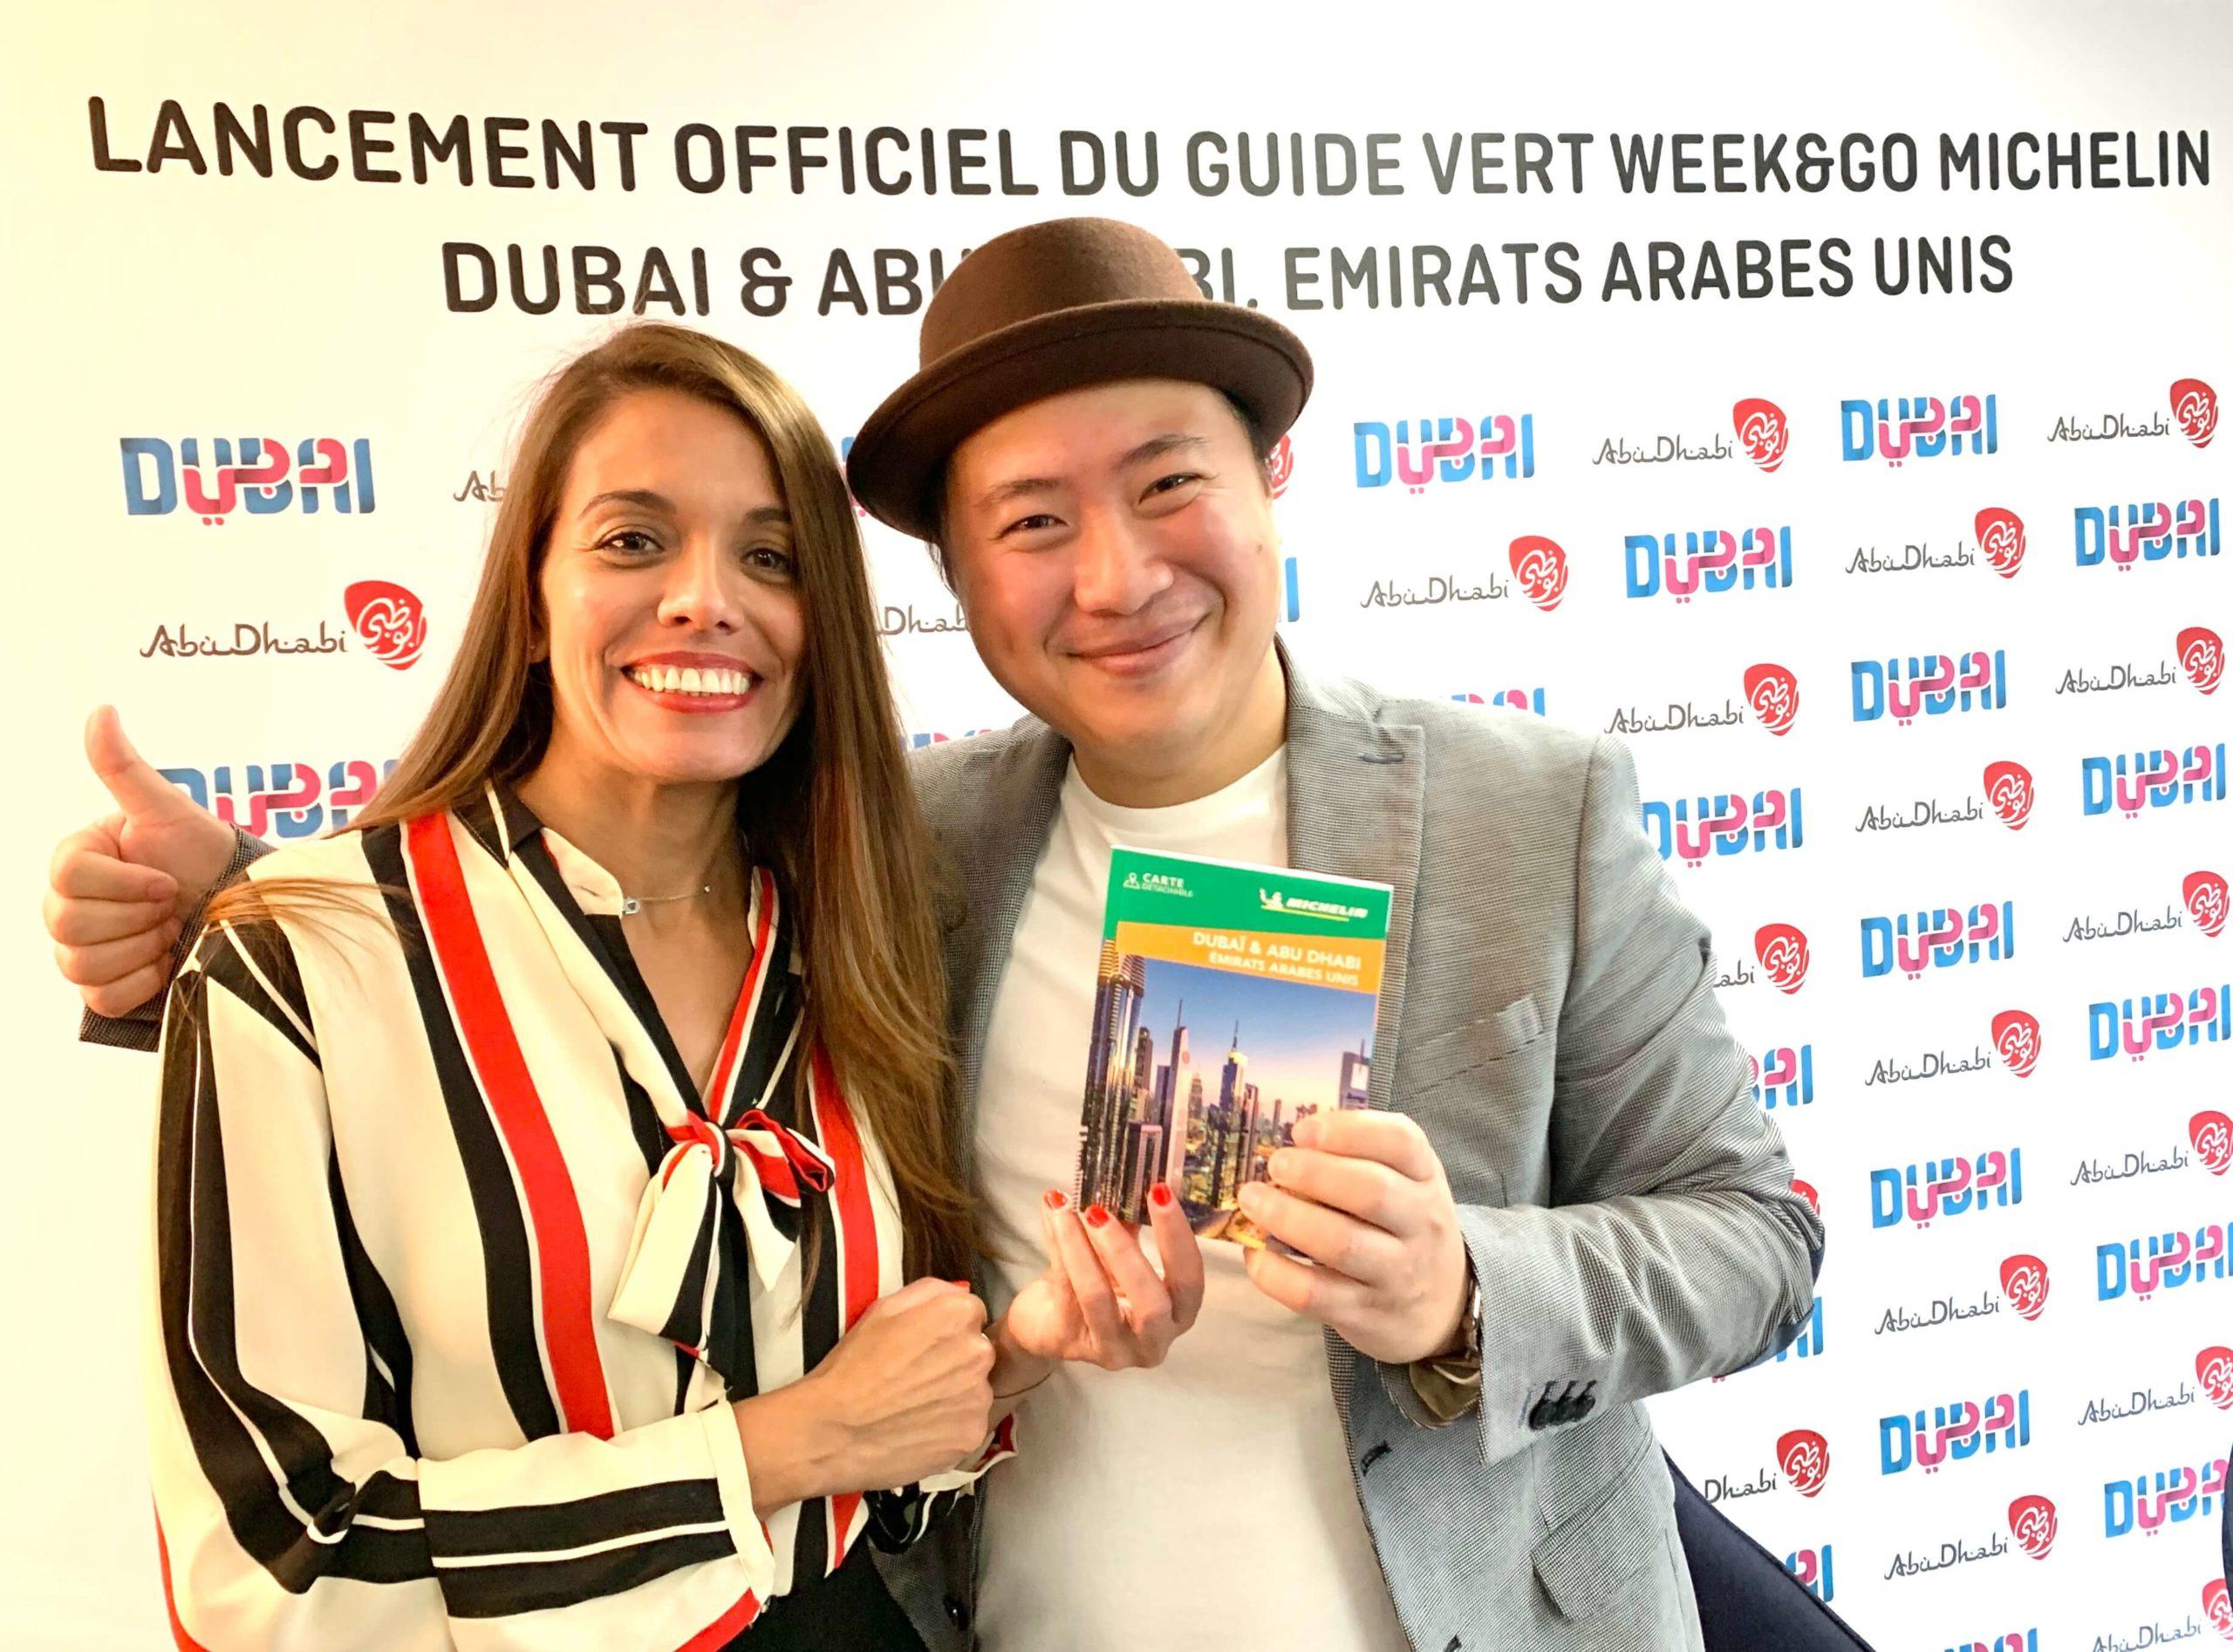 Hoang et Nora - Lancement du Guide Week&Go Michelin Dubai et Abu Dhabi